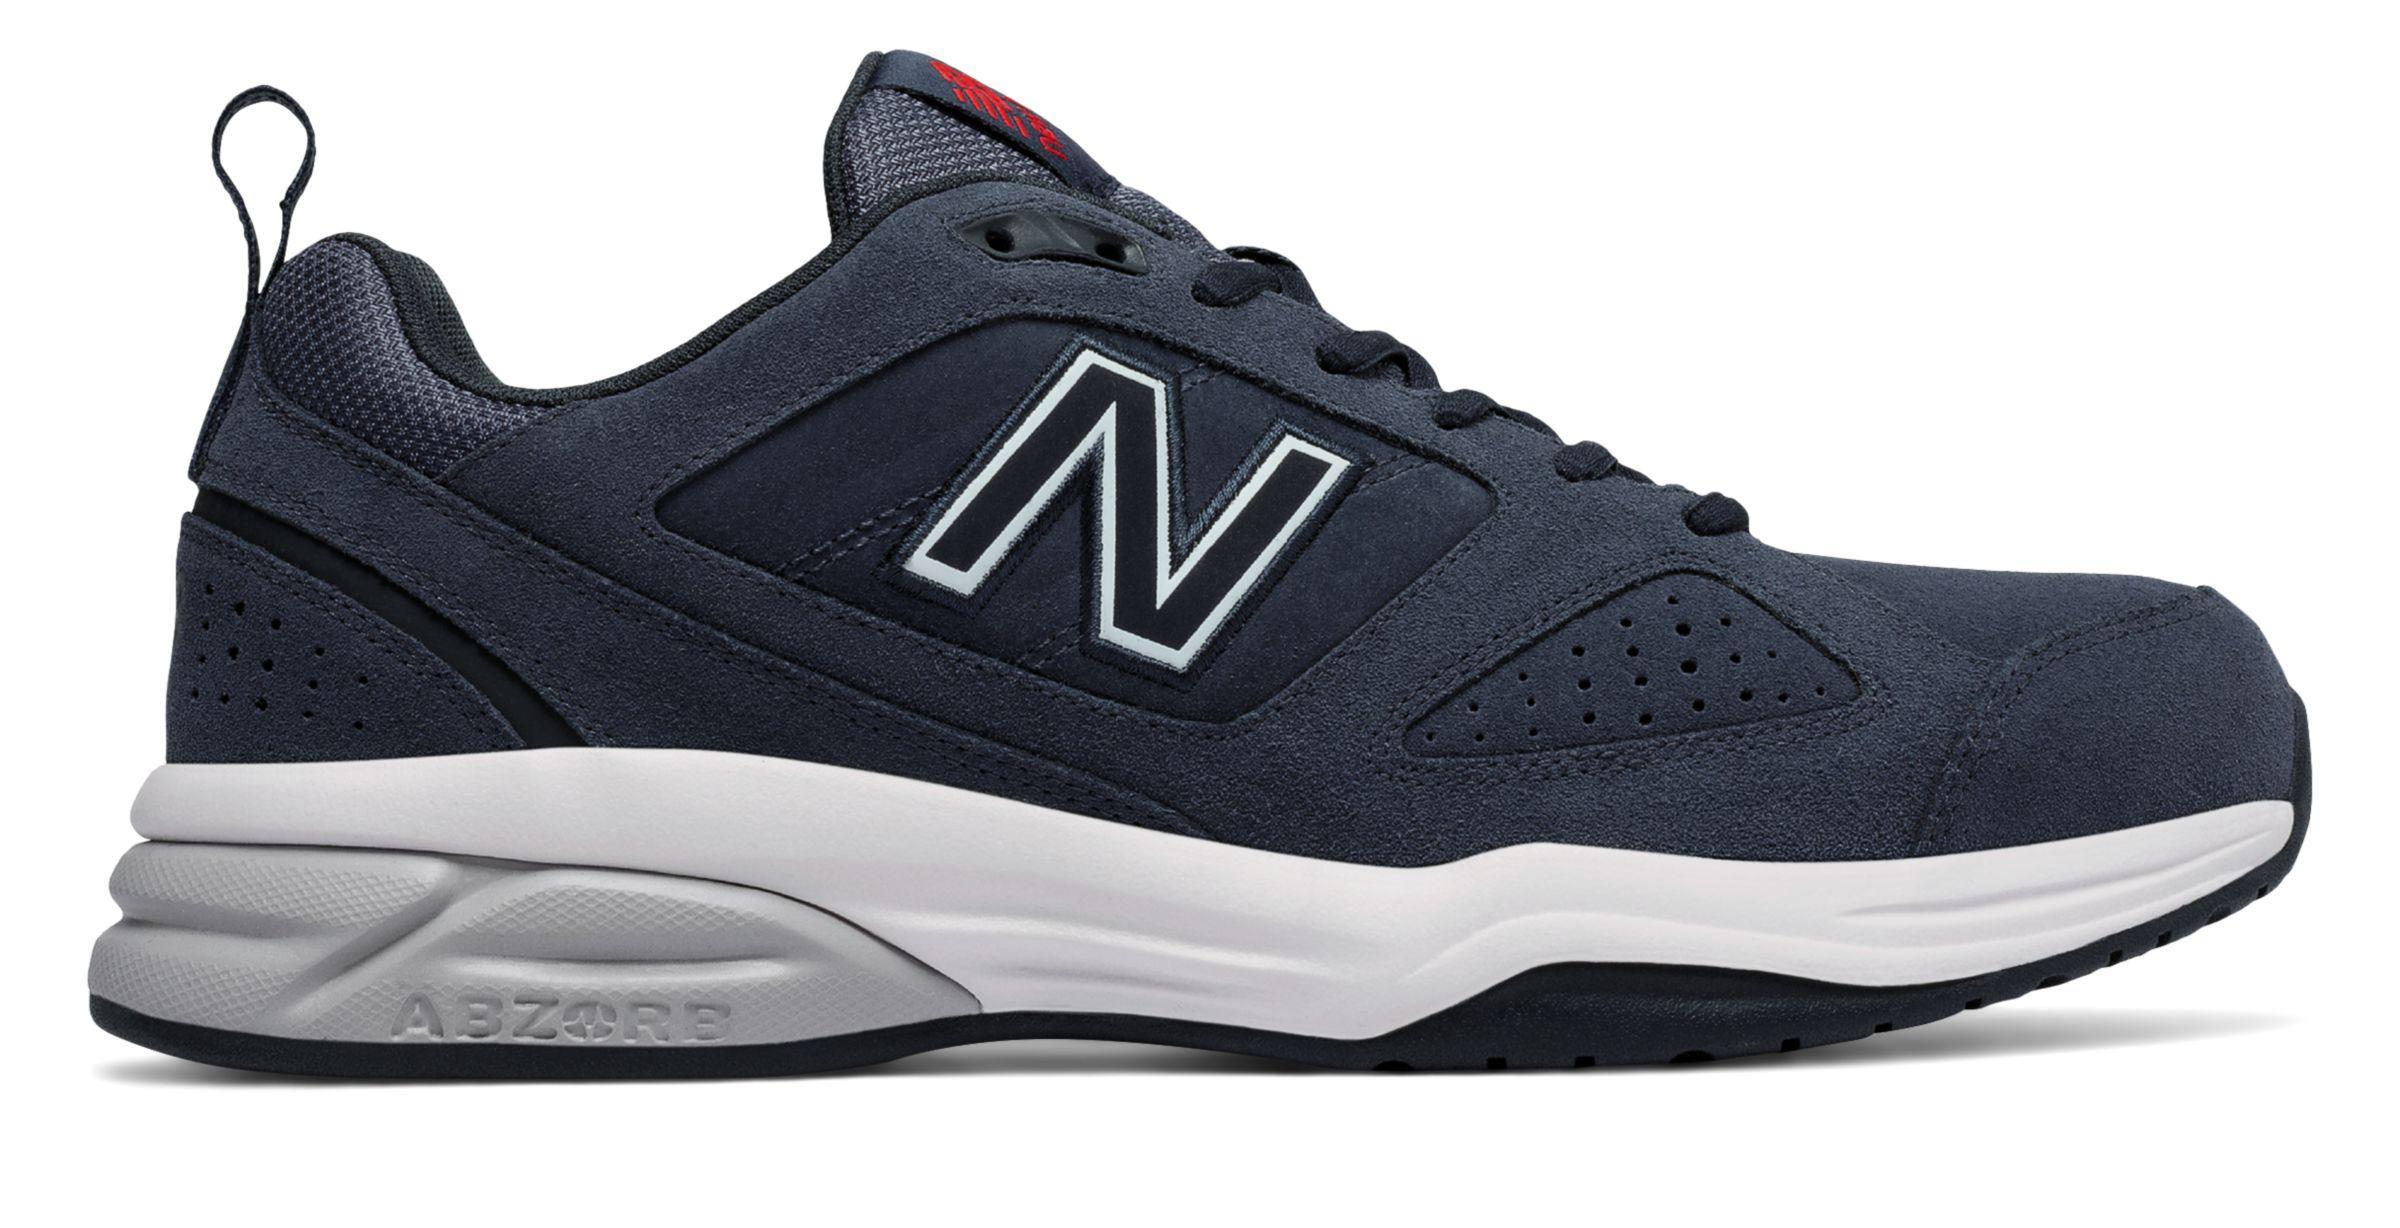 New Balance 623v3 low